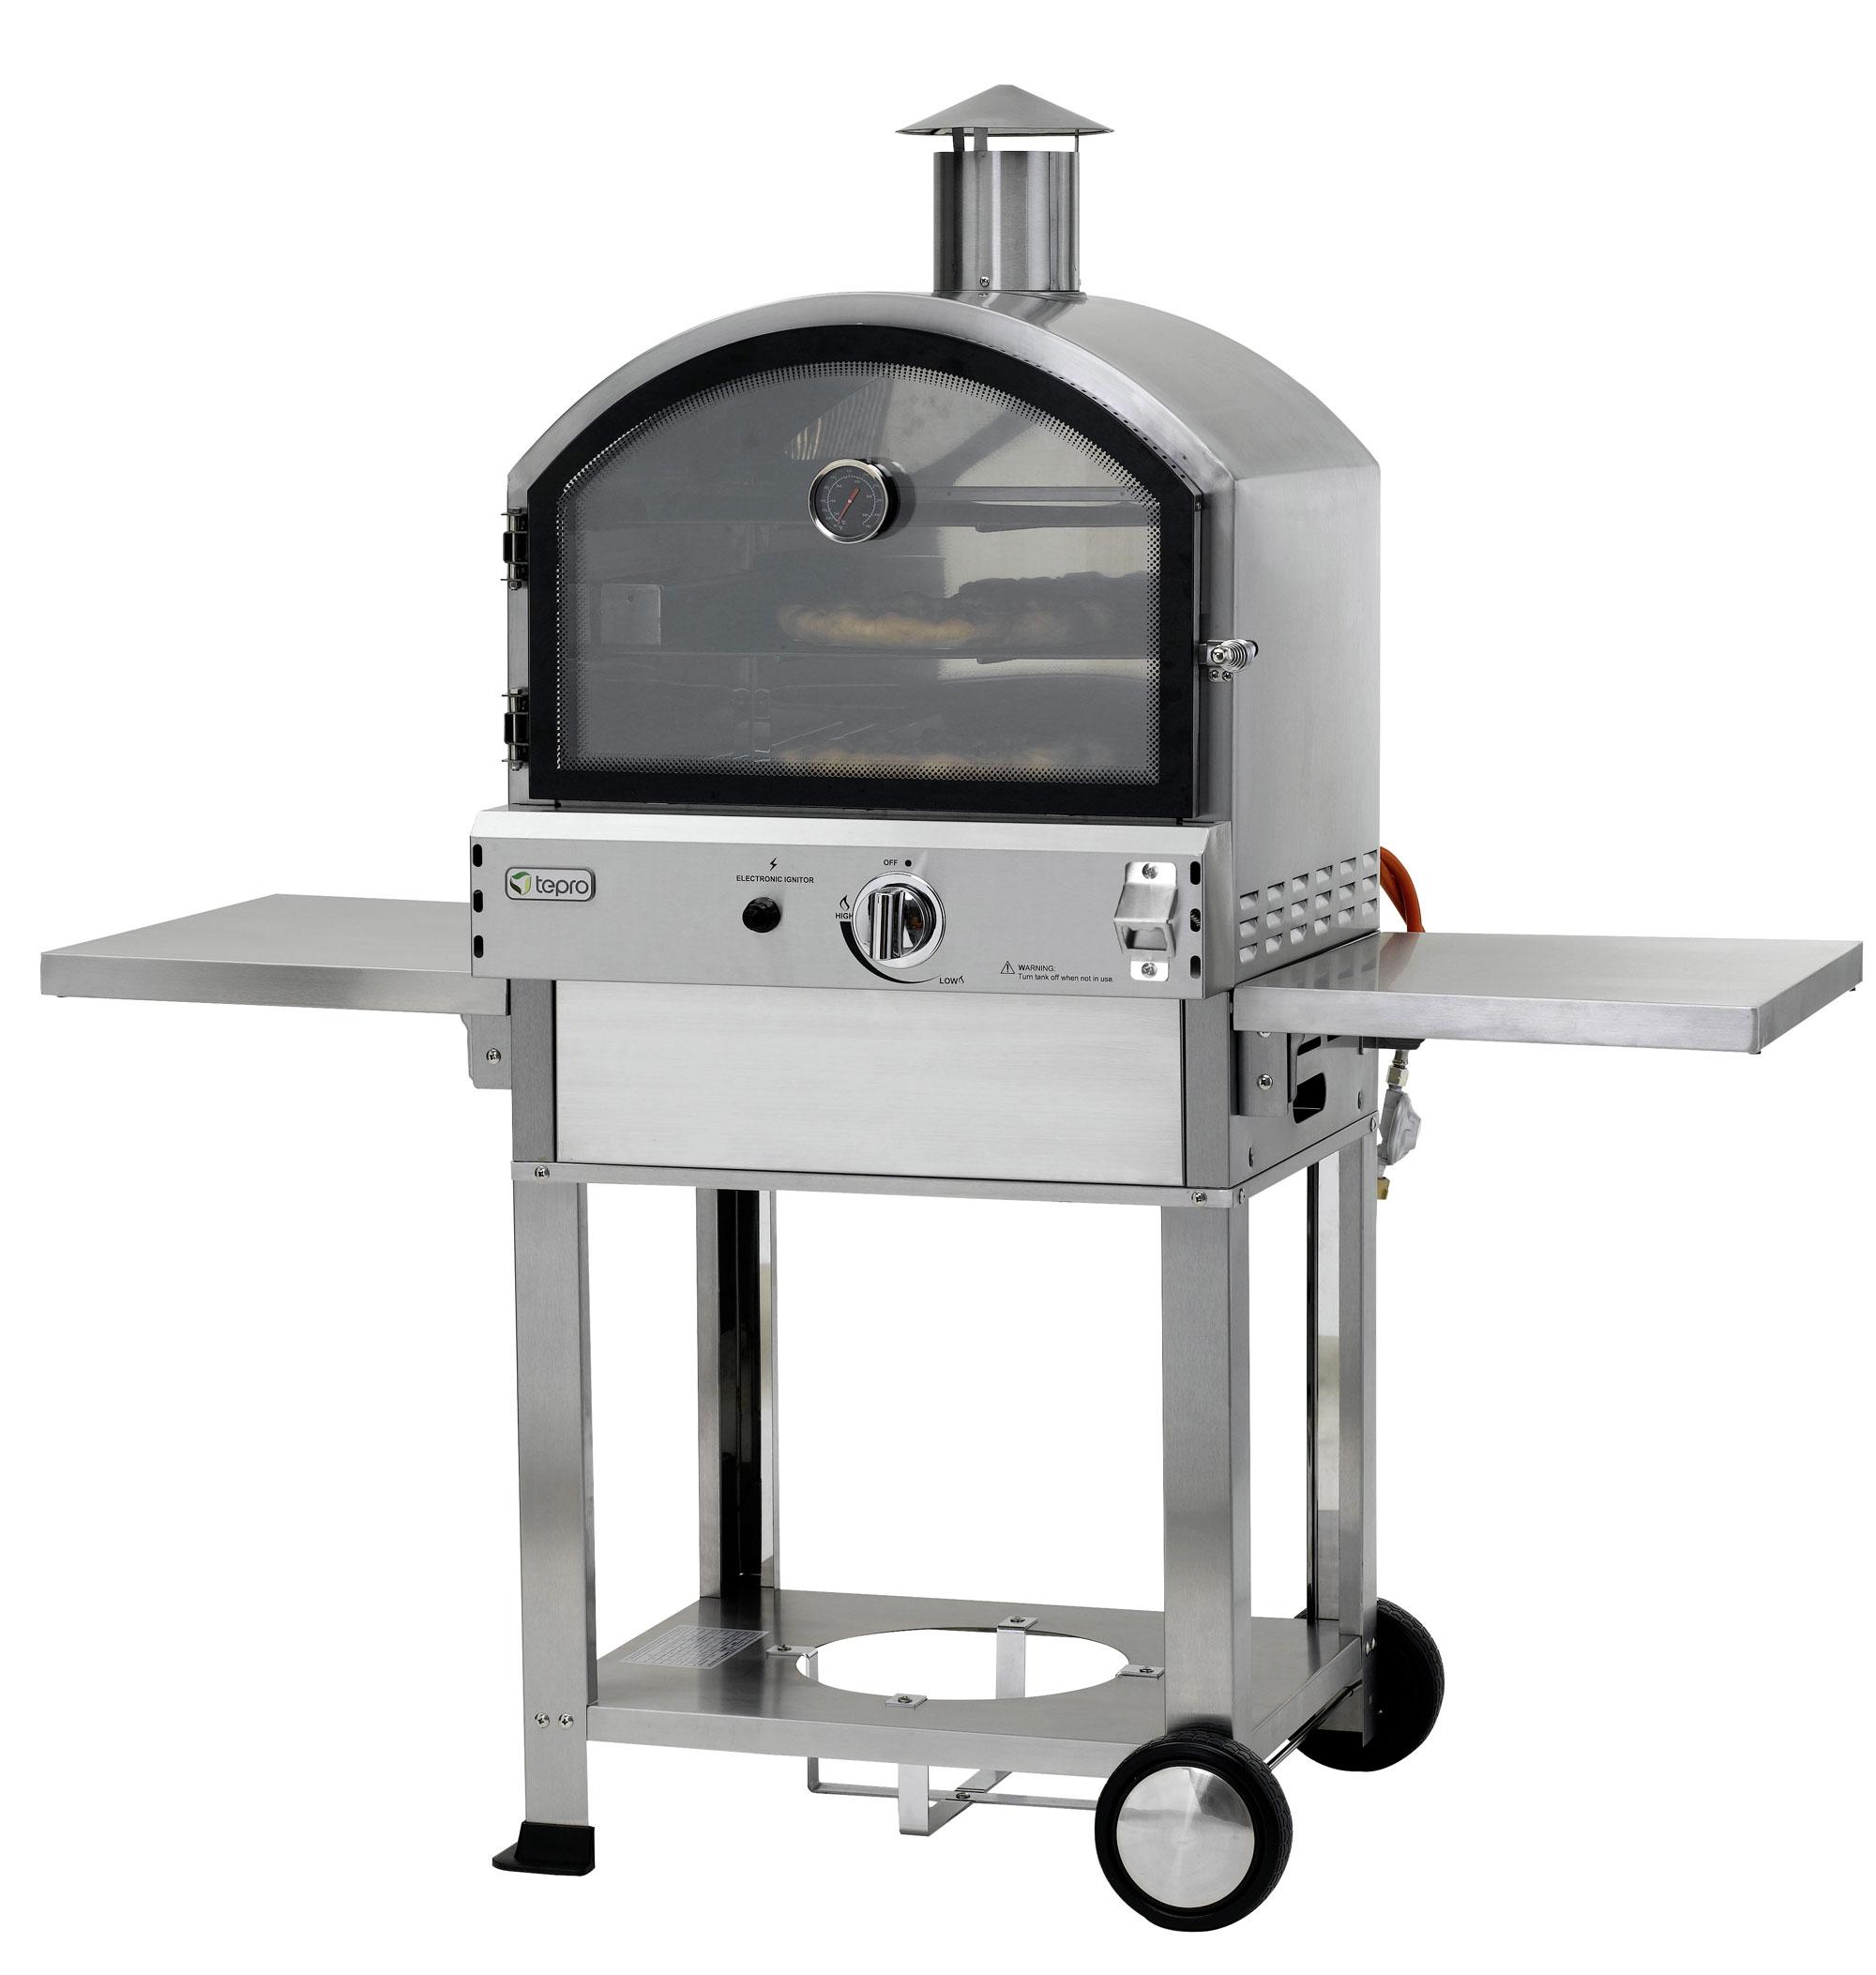 Tepro Pizzaofen Gas / Gas-Pizzaofen / Flammkuchenofen Santa Fe Bild 1